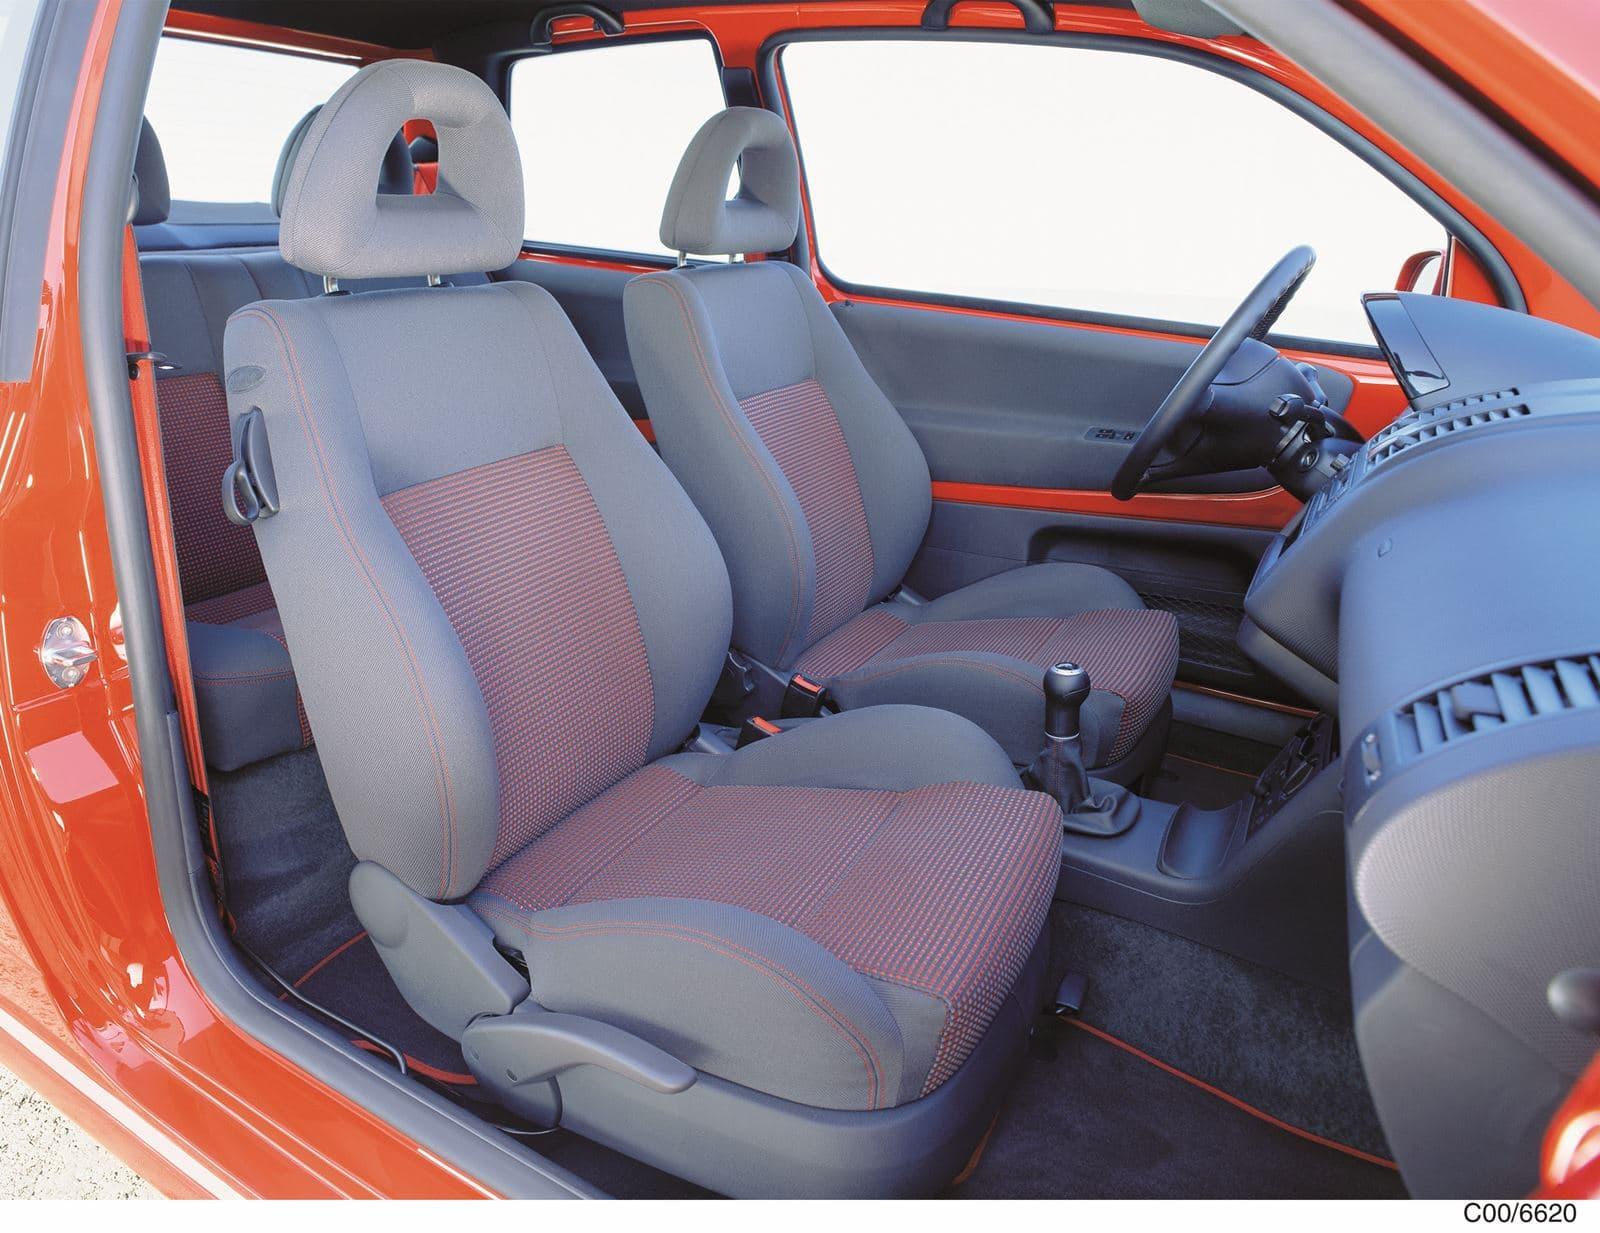 Volkswagen Lupo GTI interior